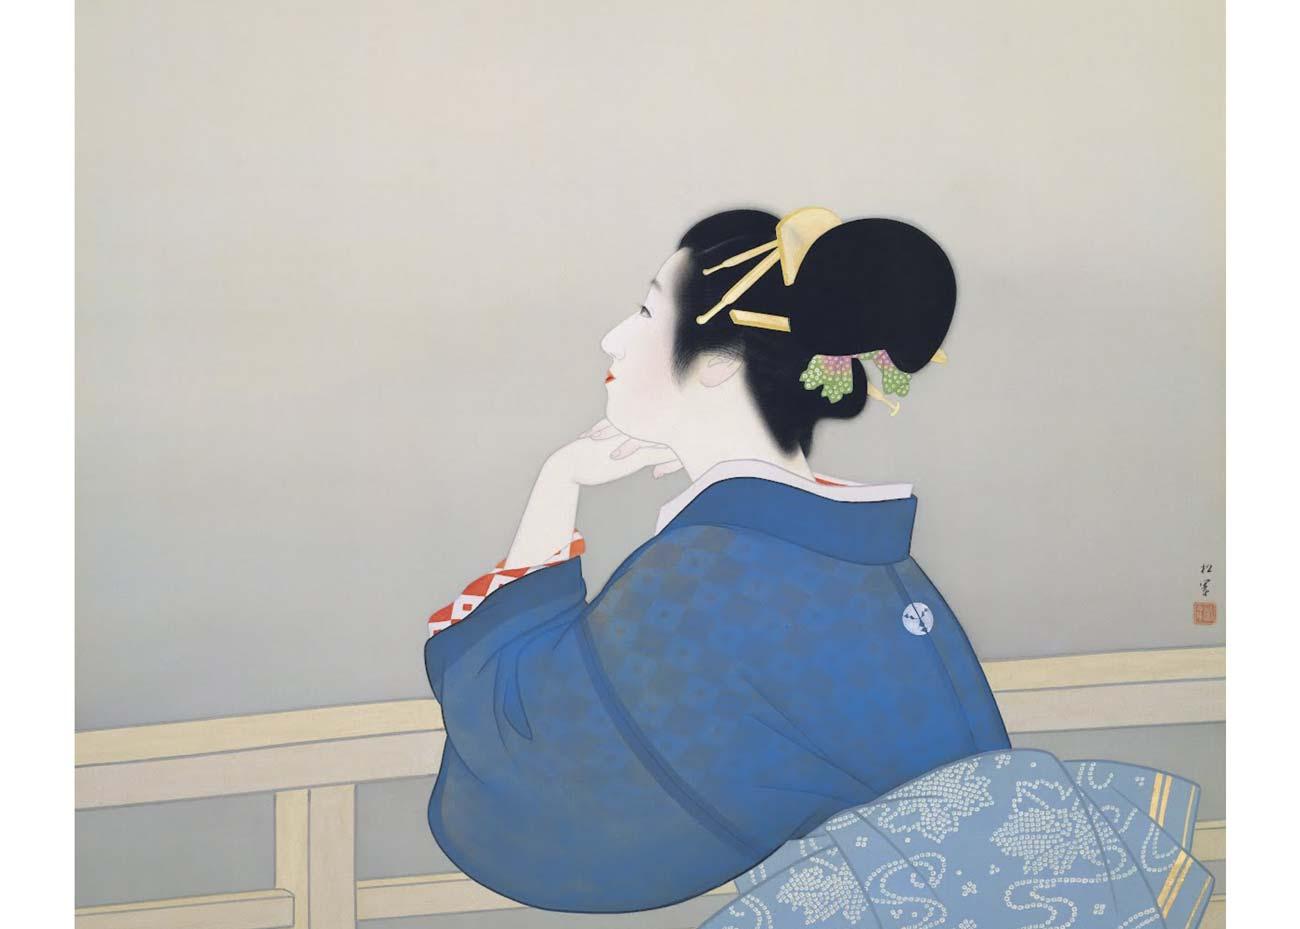 © Uemura Shoen, Woman Waiting for the Moon to Rise, Nihonga Painting, 1944, Adachi Museum of Art